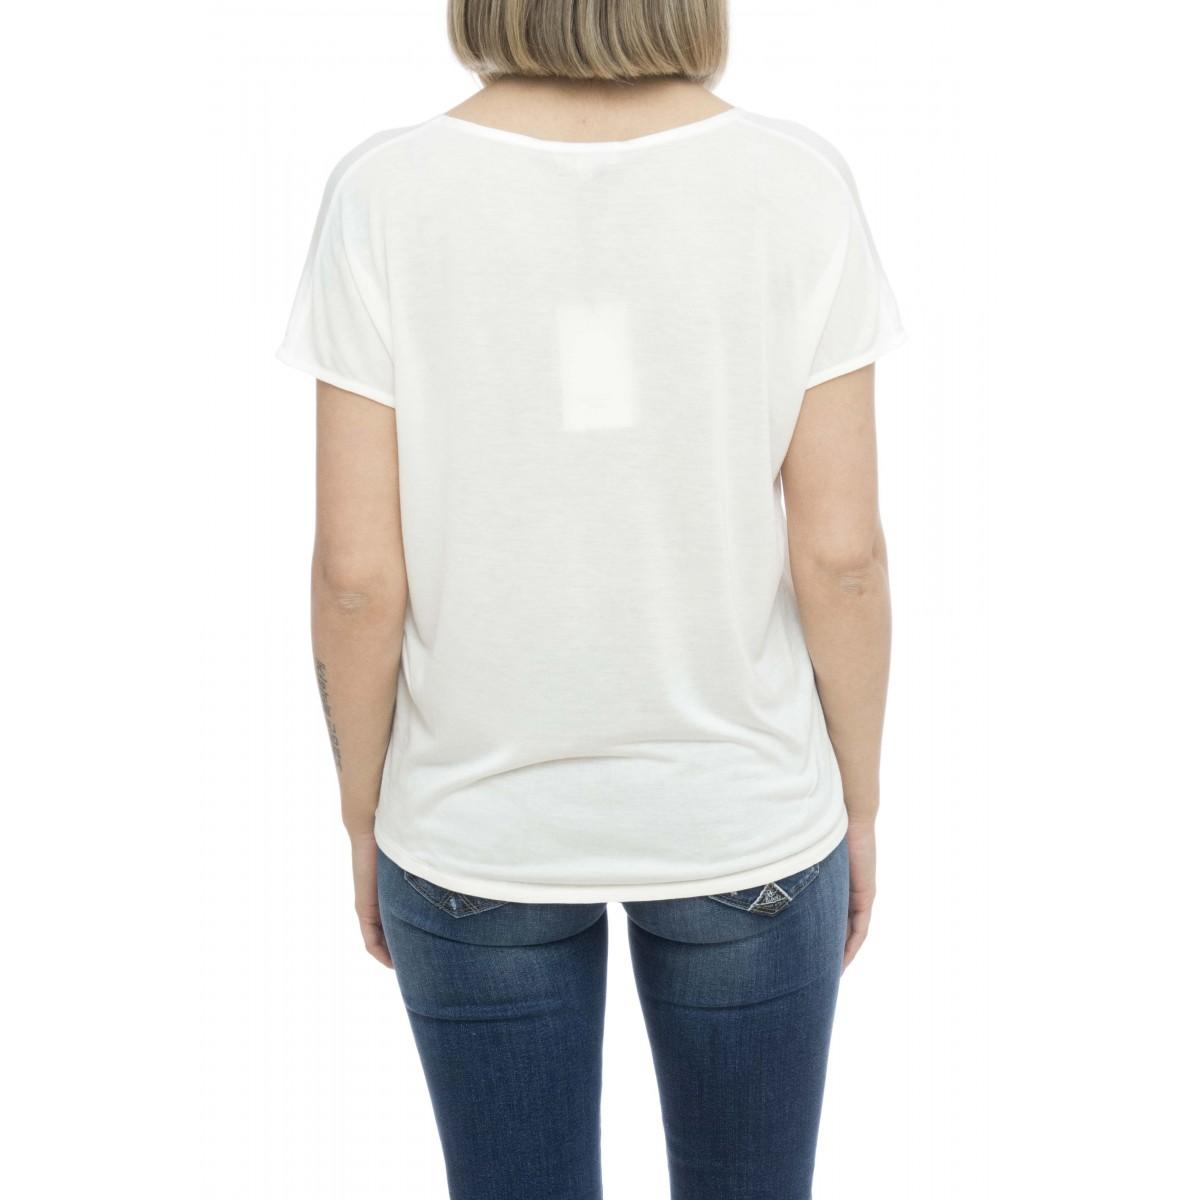 T-shirt donna - Milac t-shirt doppio tessuto